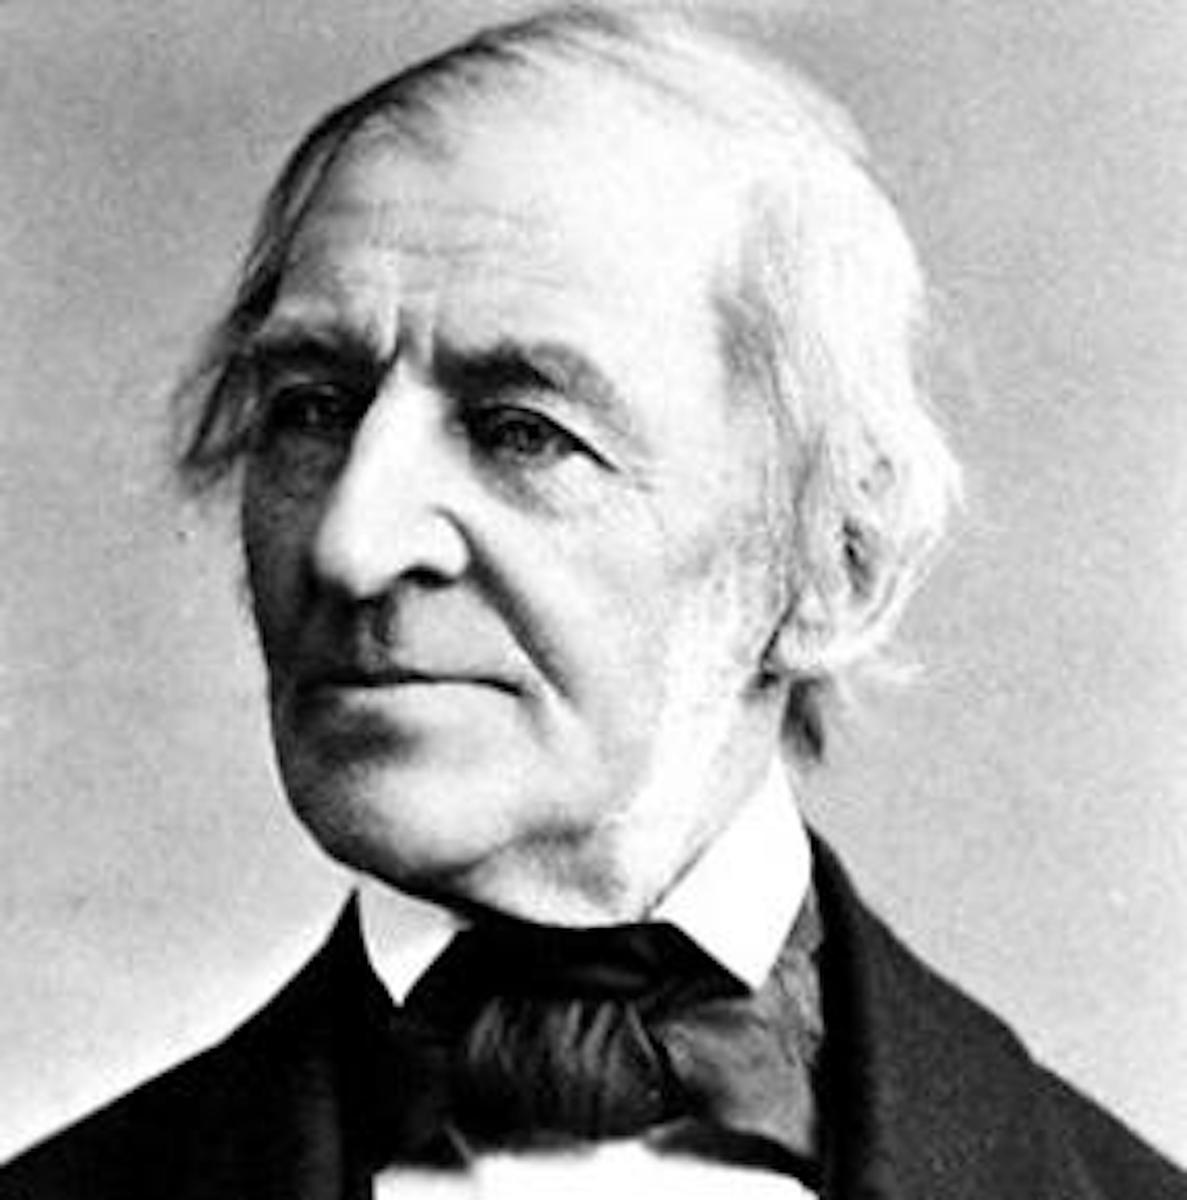 Ralph Waldo Emerson's